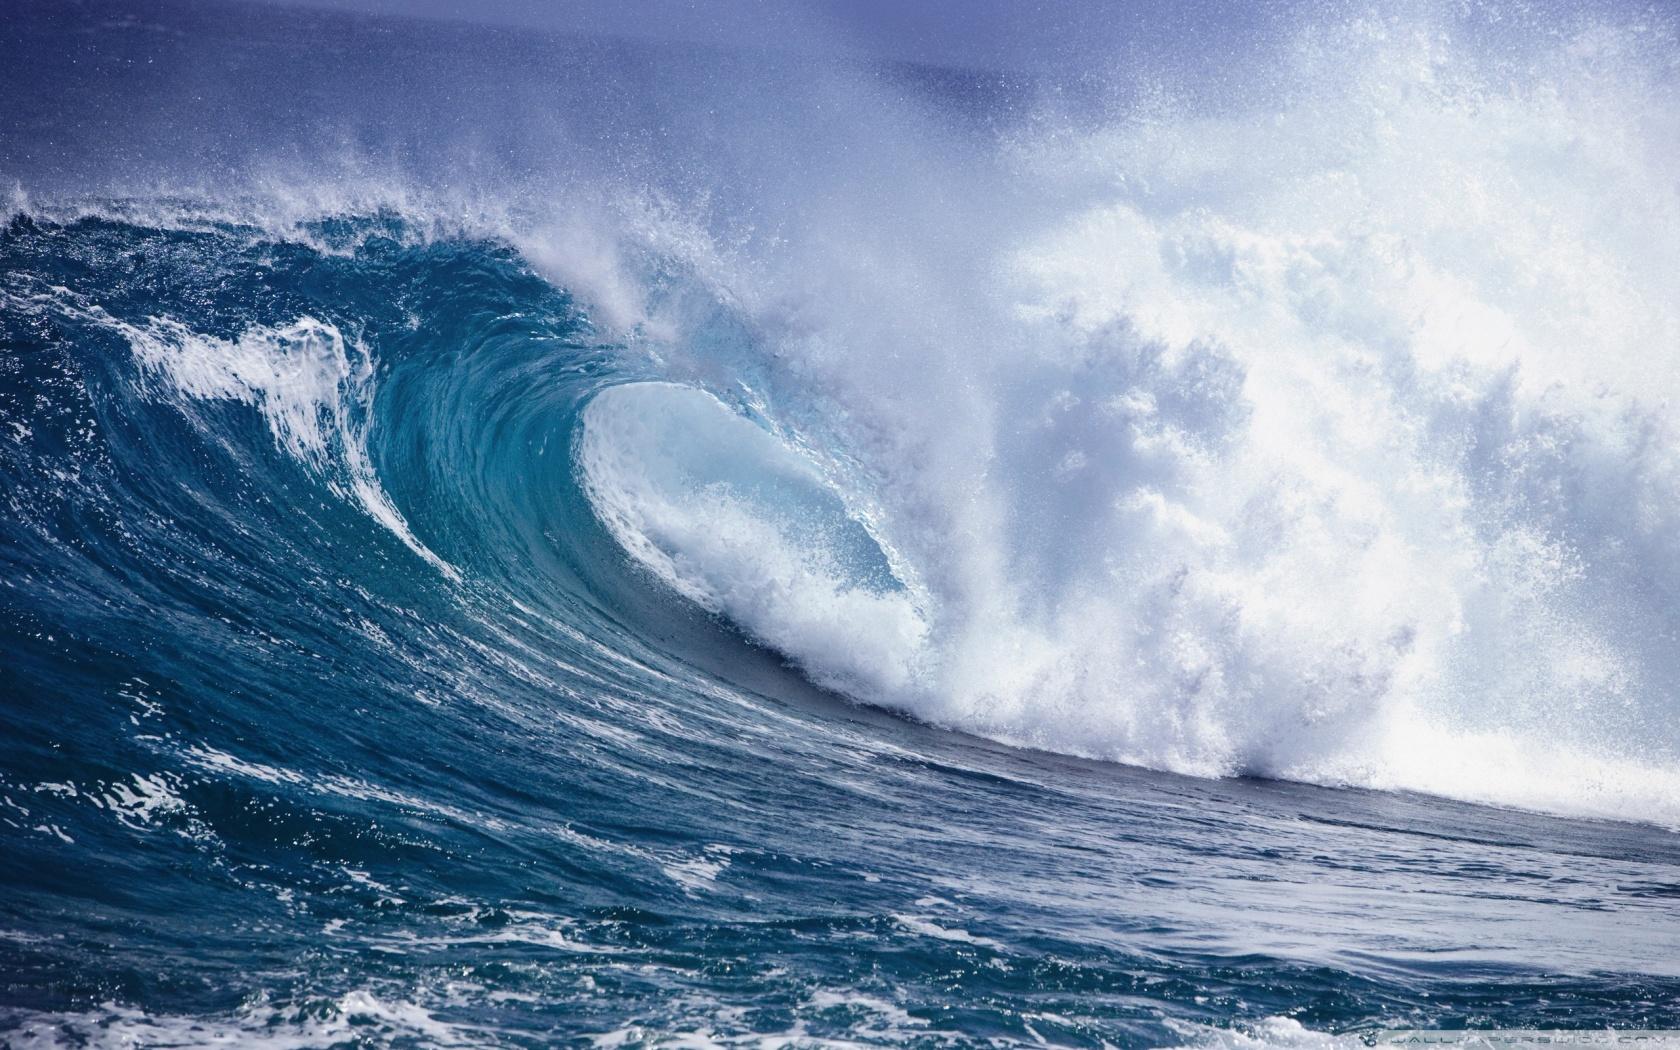 Fascinating Ocean Wave Wallpaper 1680x1050px